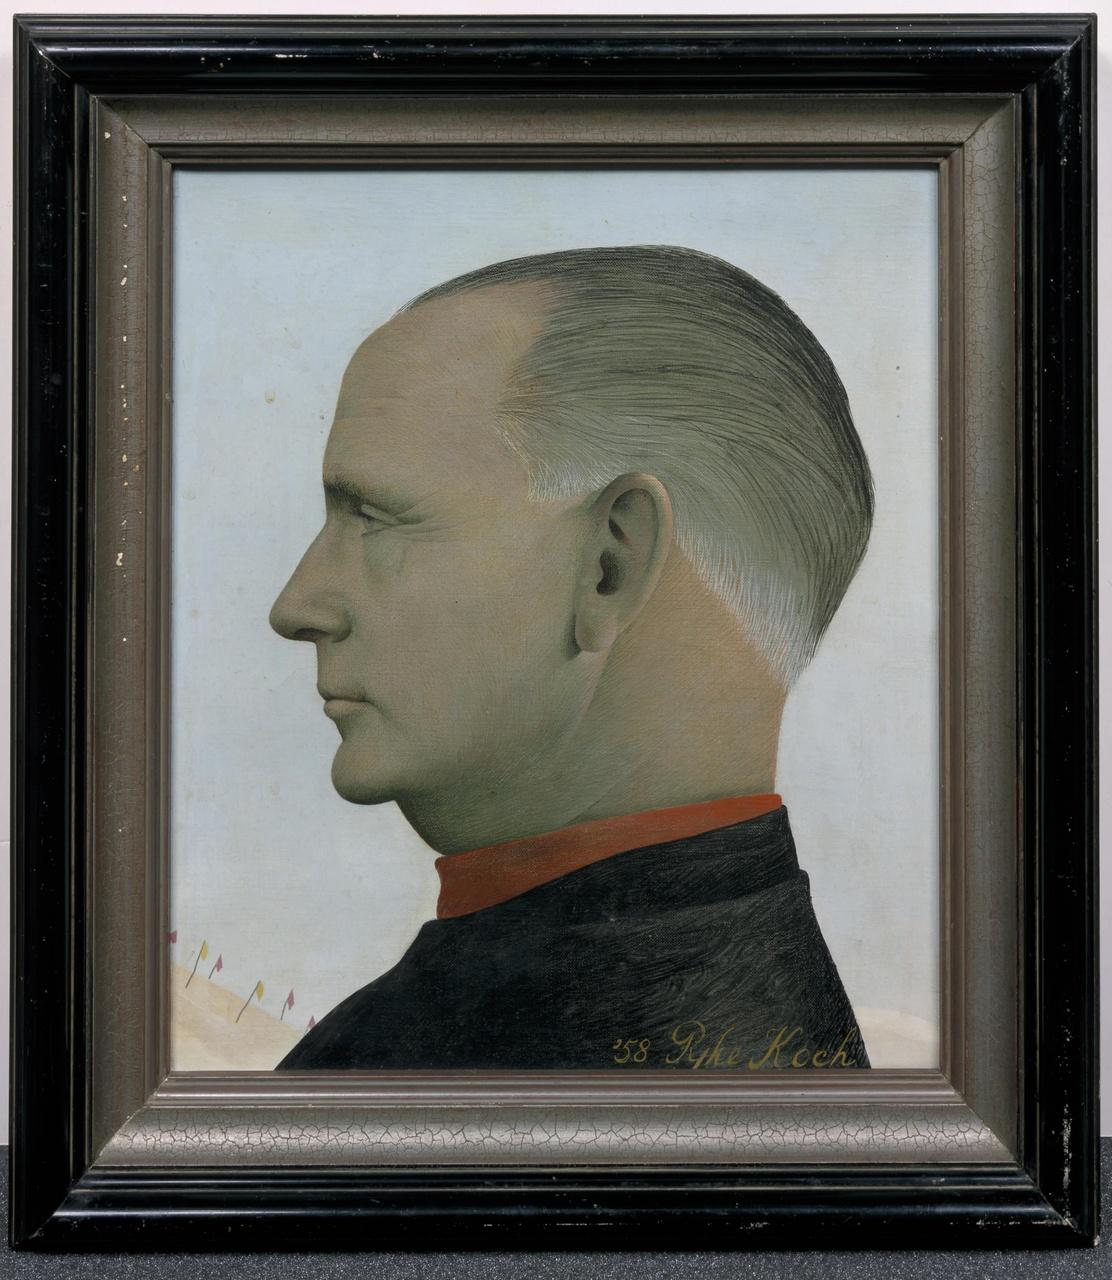 Portret mr. L.J. van der Valk (1897-1975)